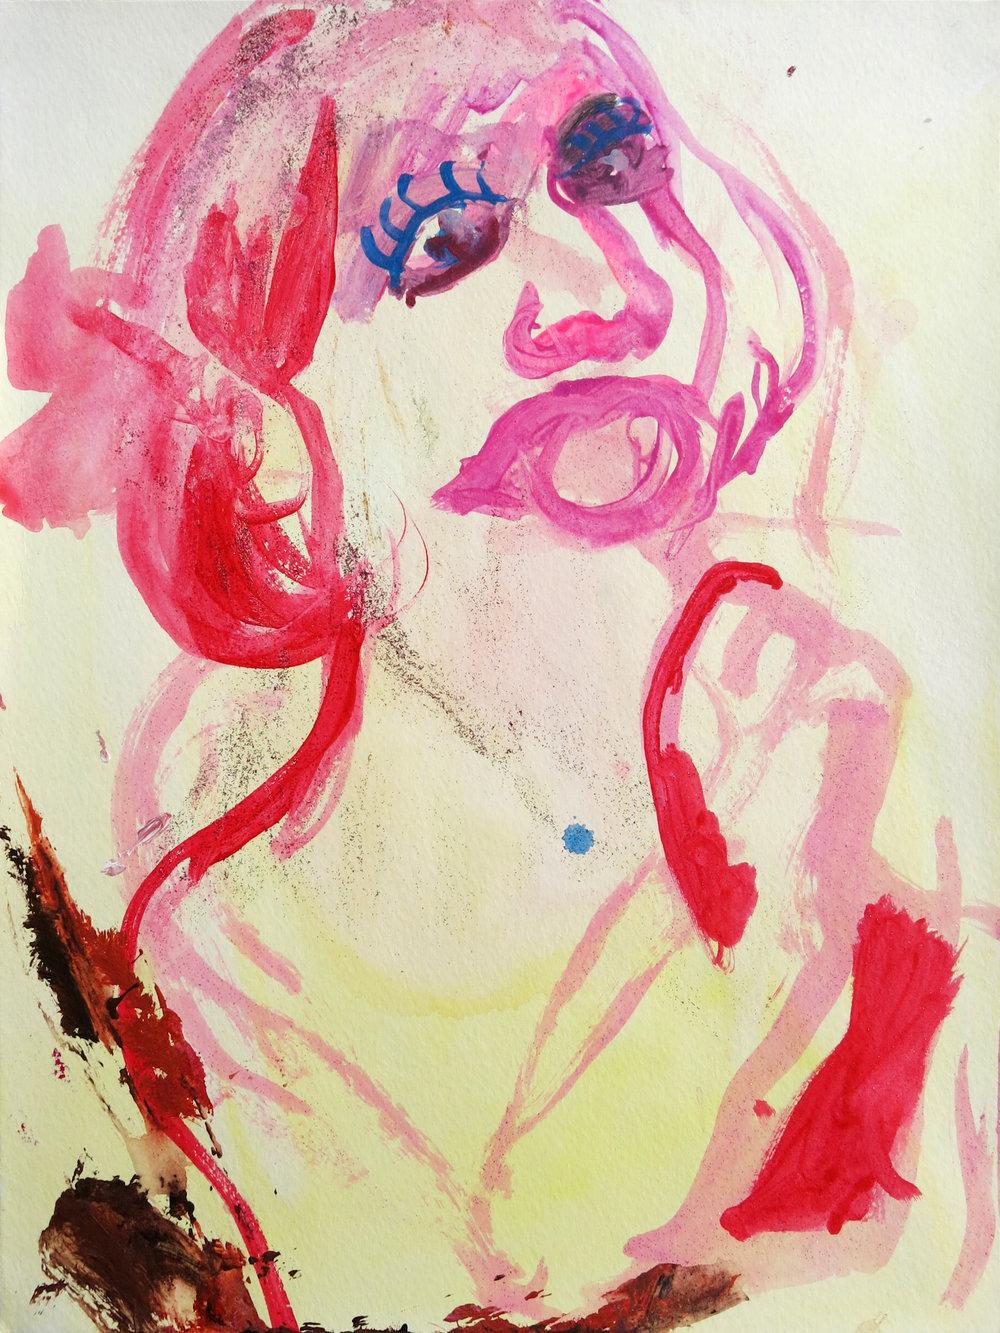 Barbra Streisand Portrait #189